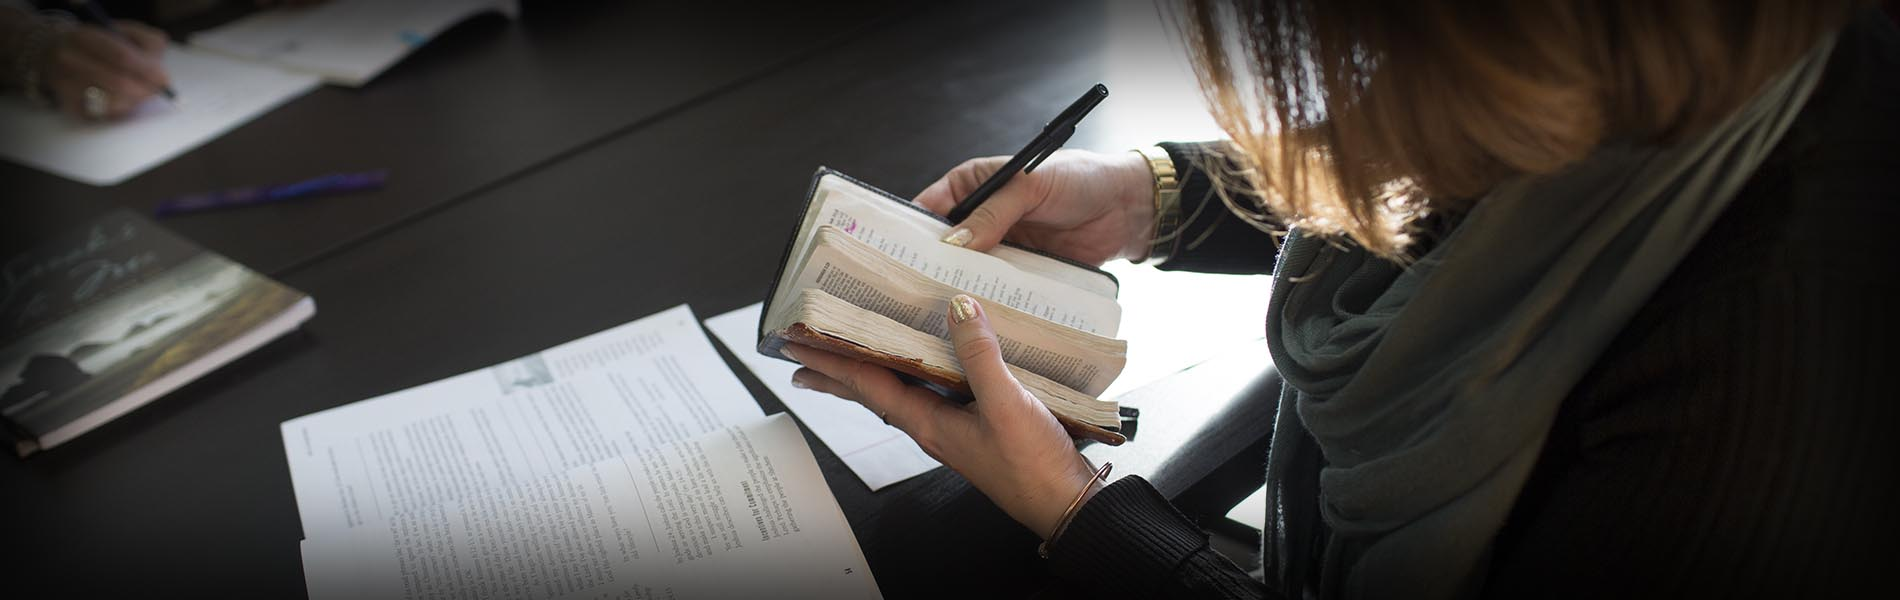 Bible Study Restoration Life